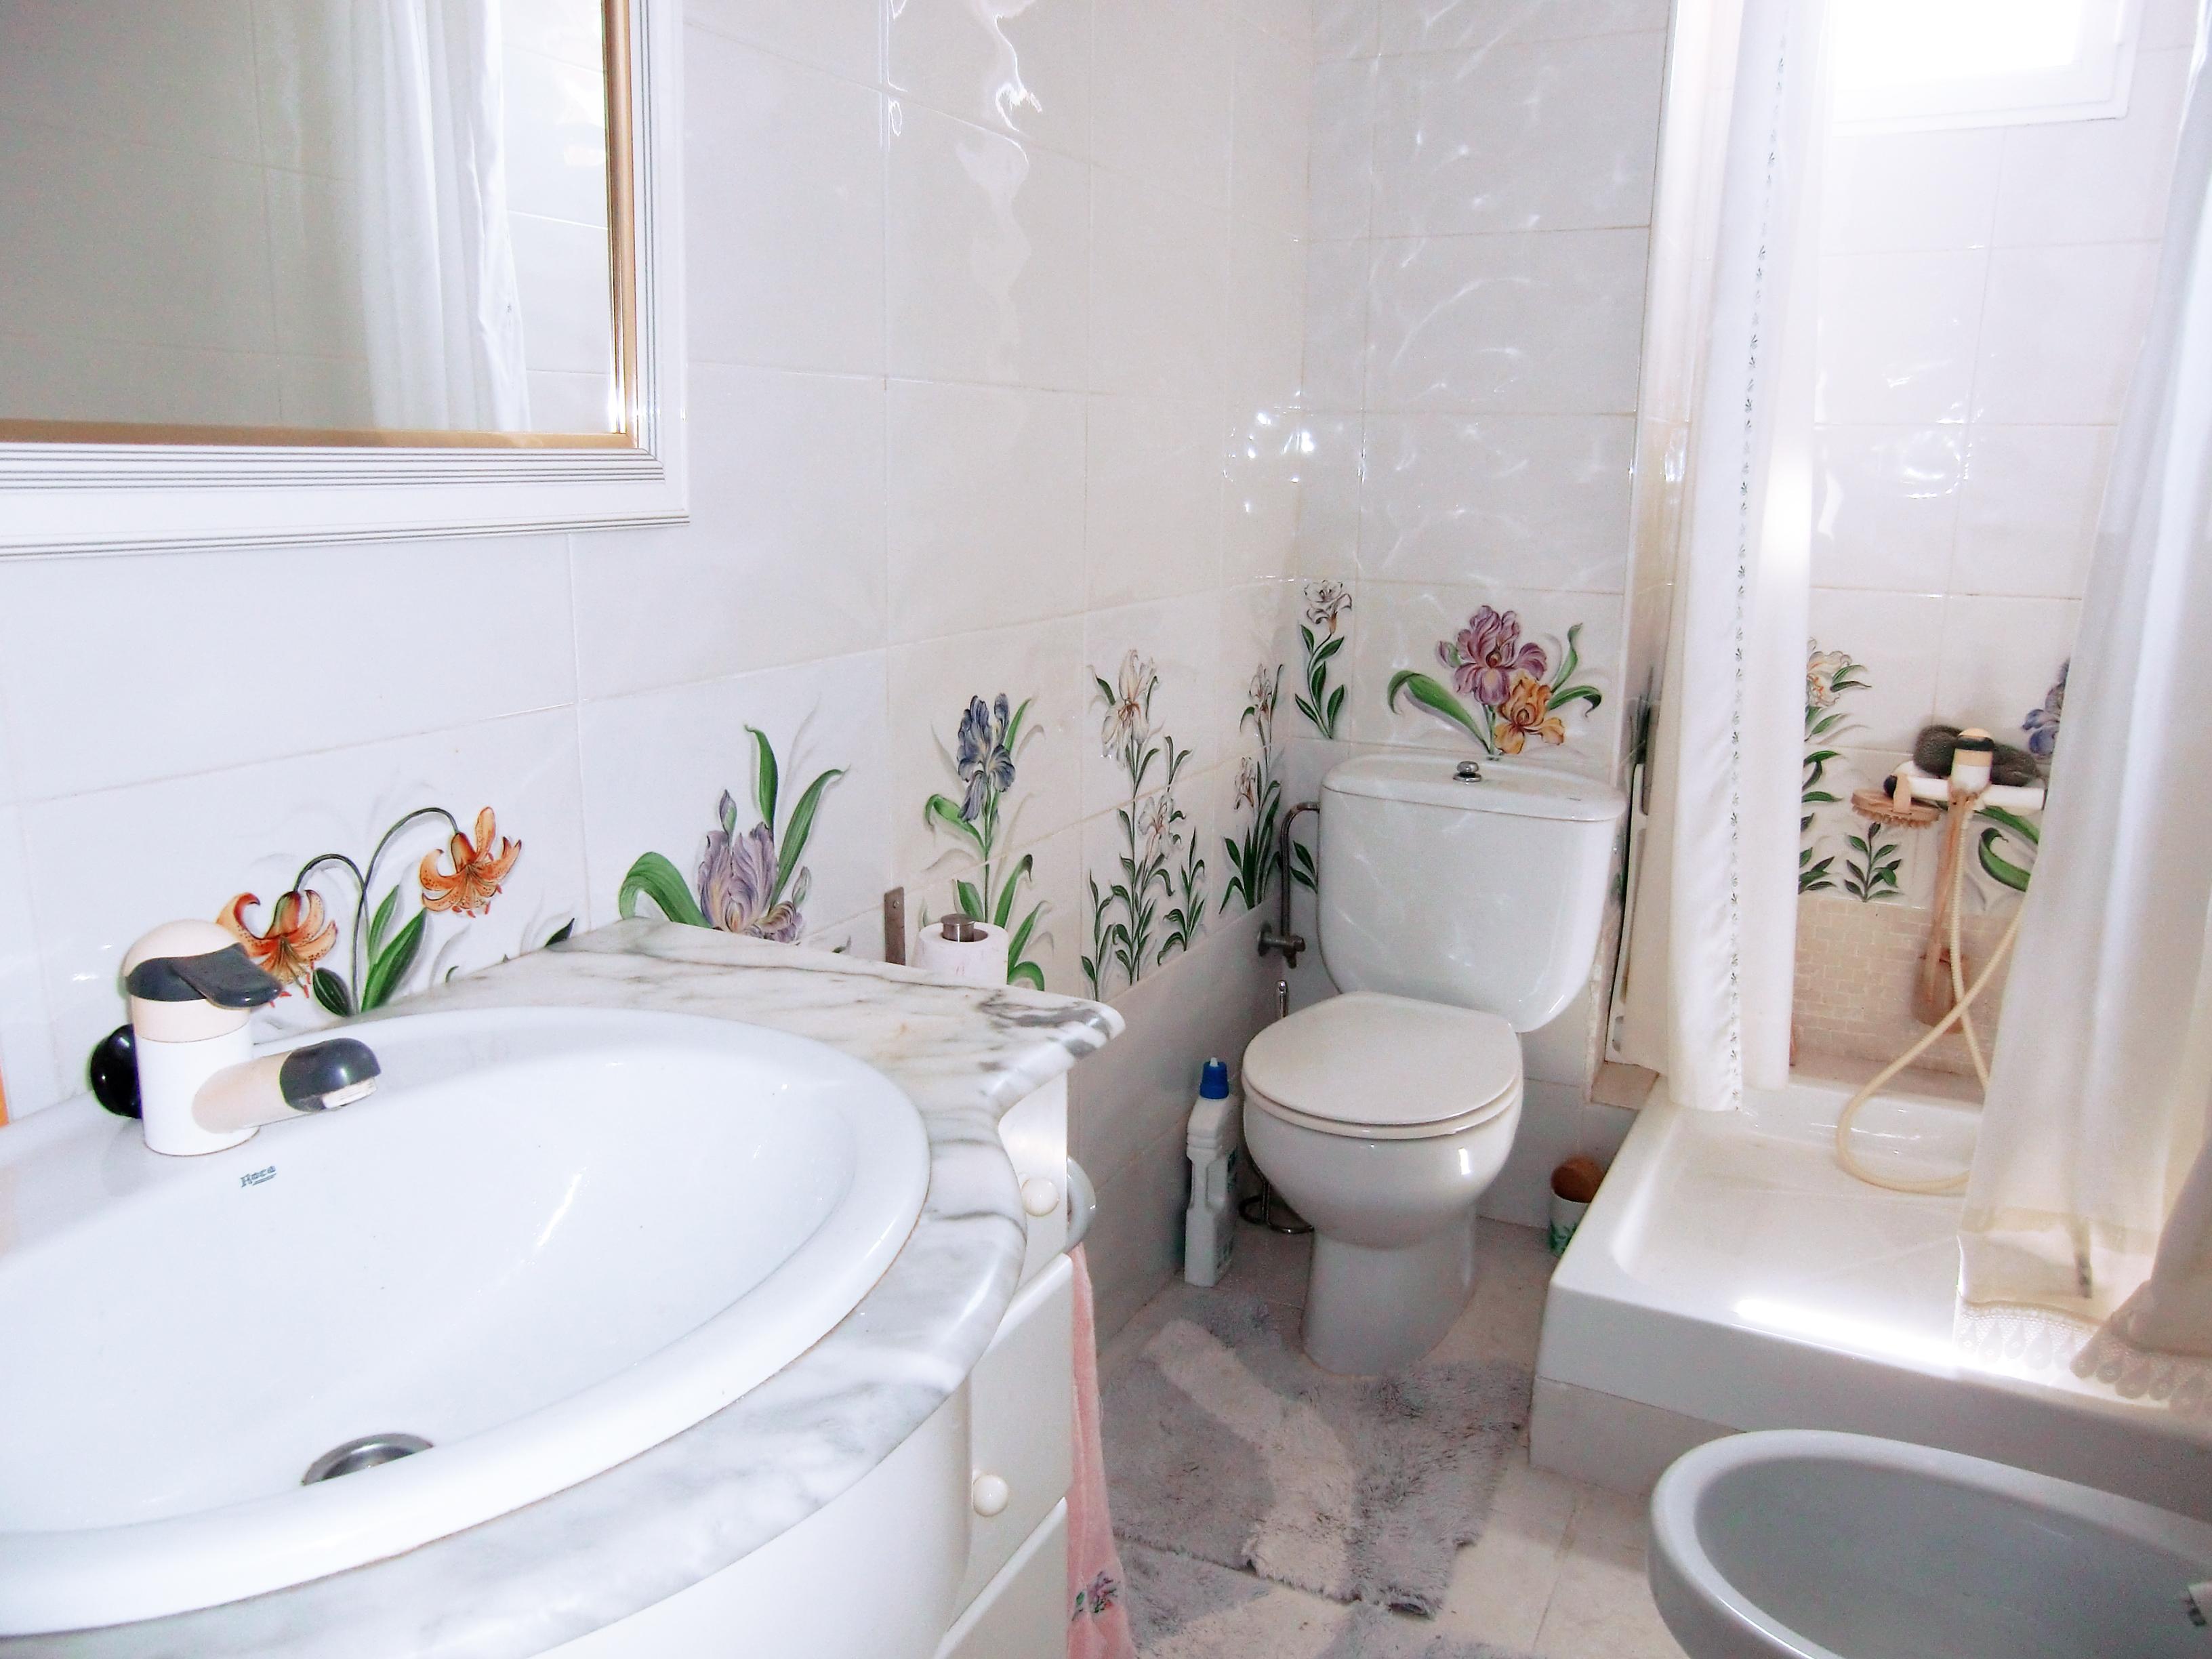 06-Baño.jpg